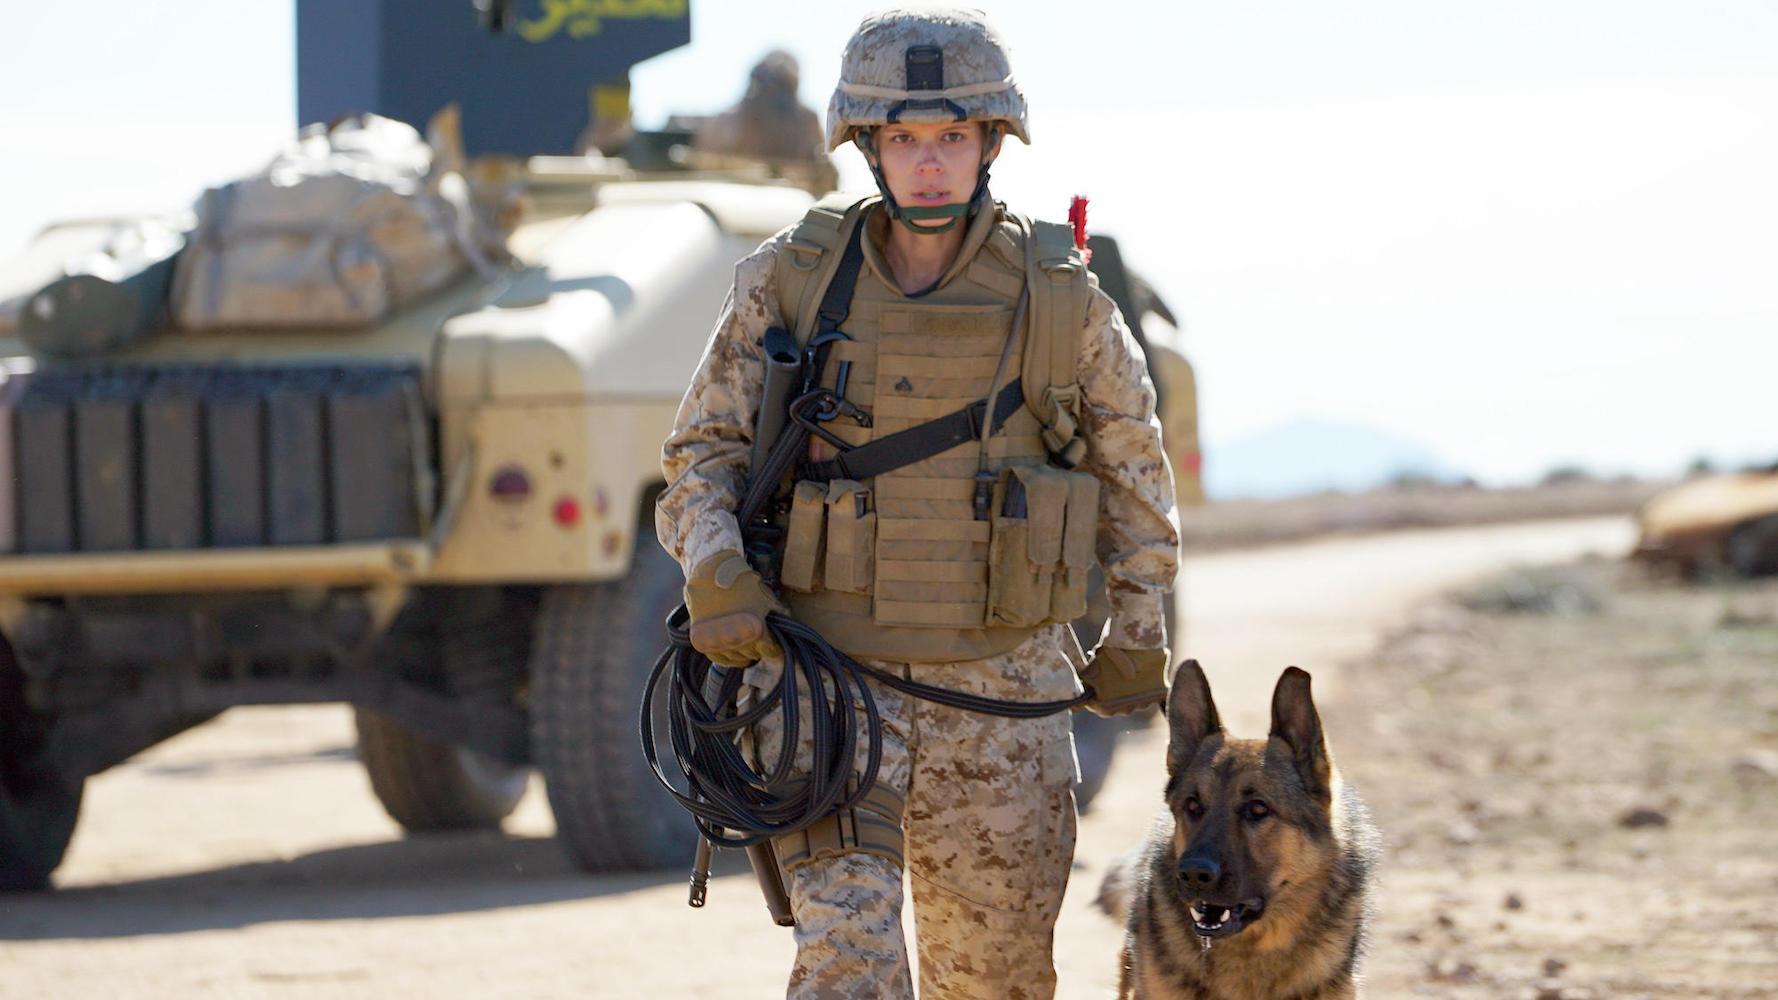 Megan Leavey Director Gabriela Cowperthwaites Dog Tale